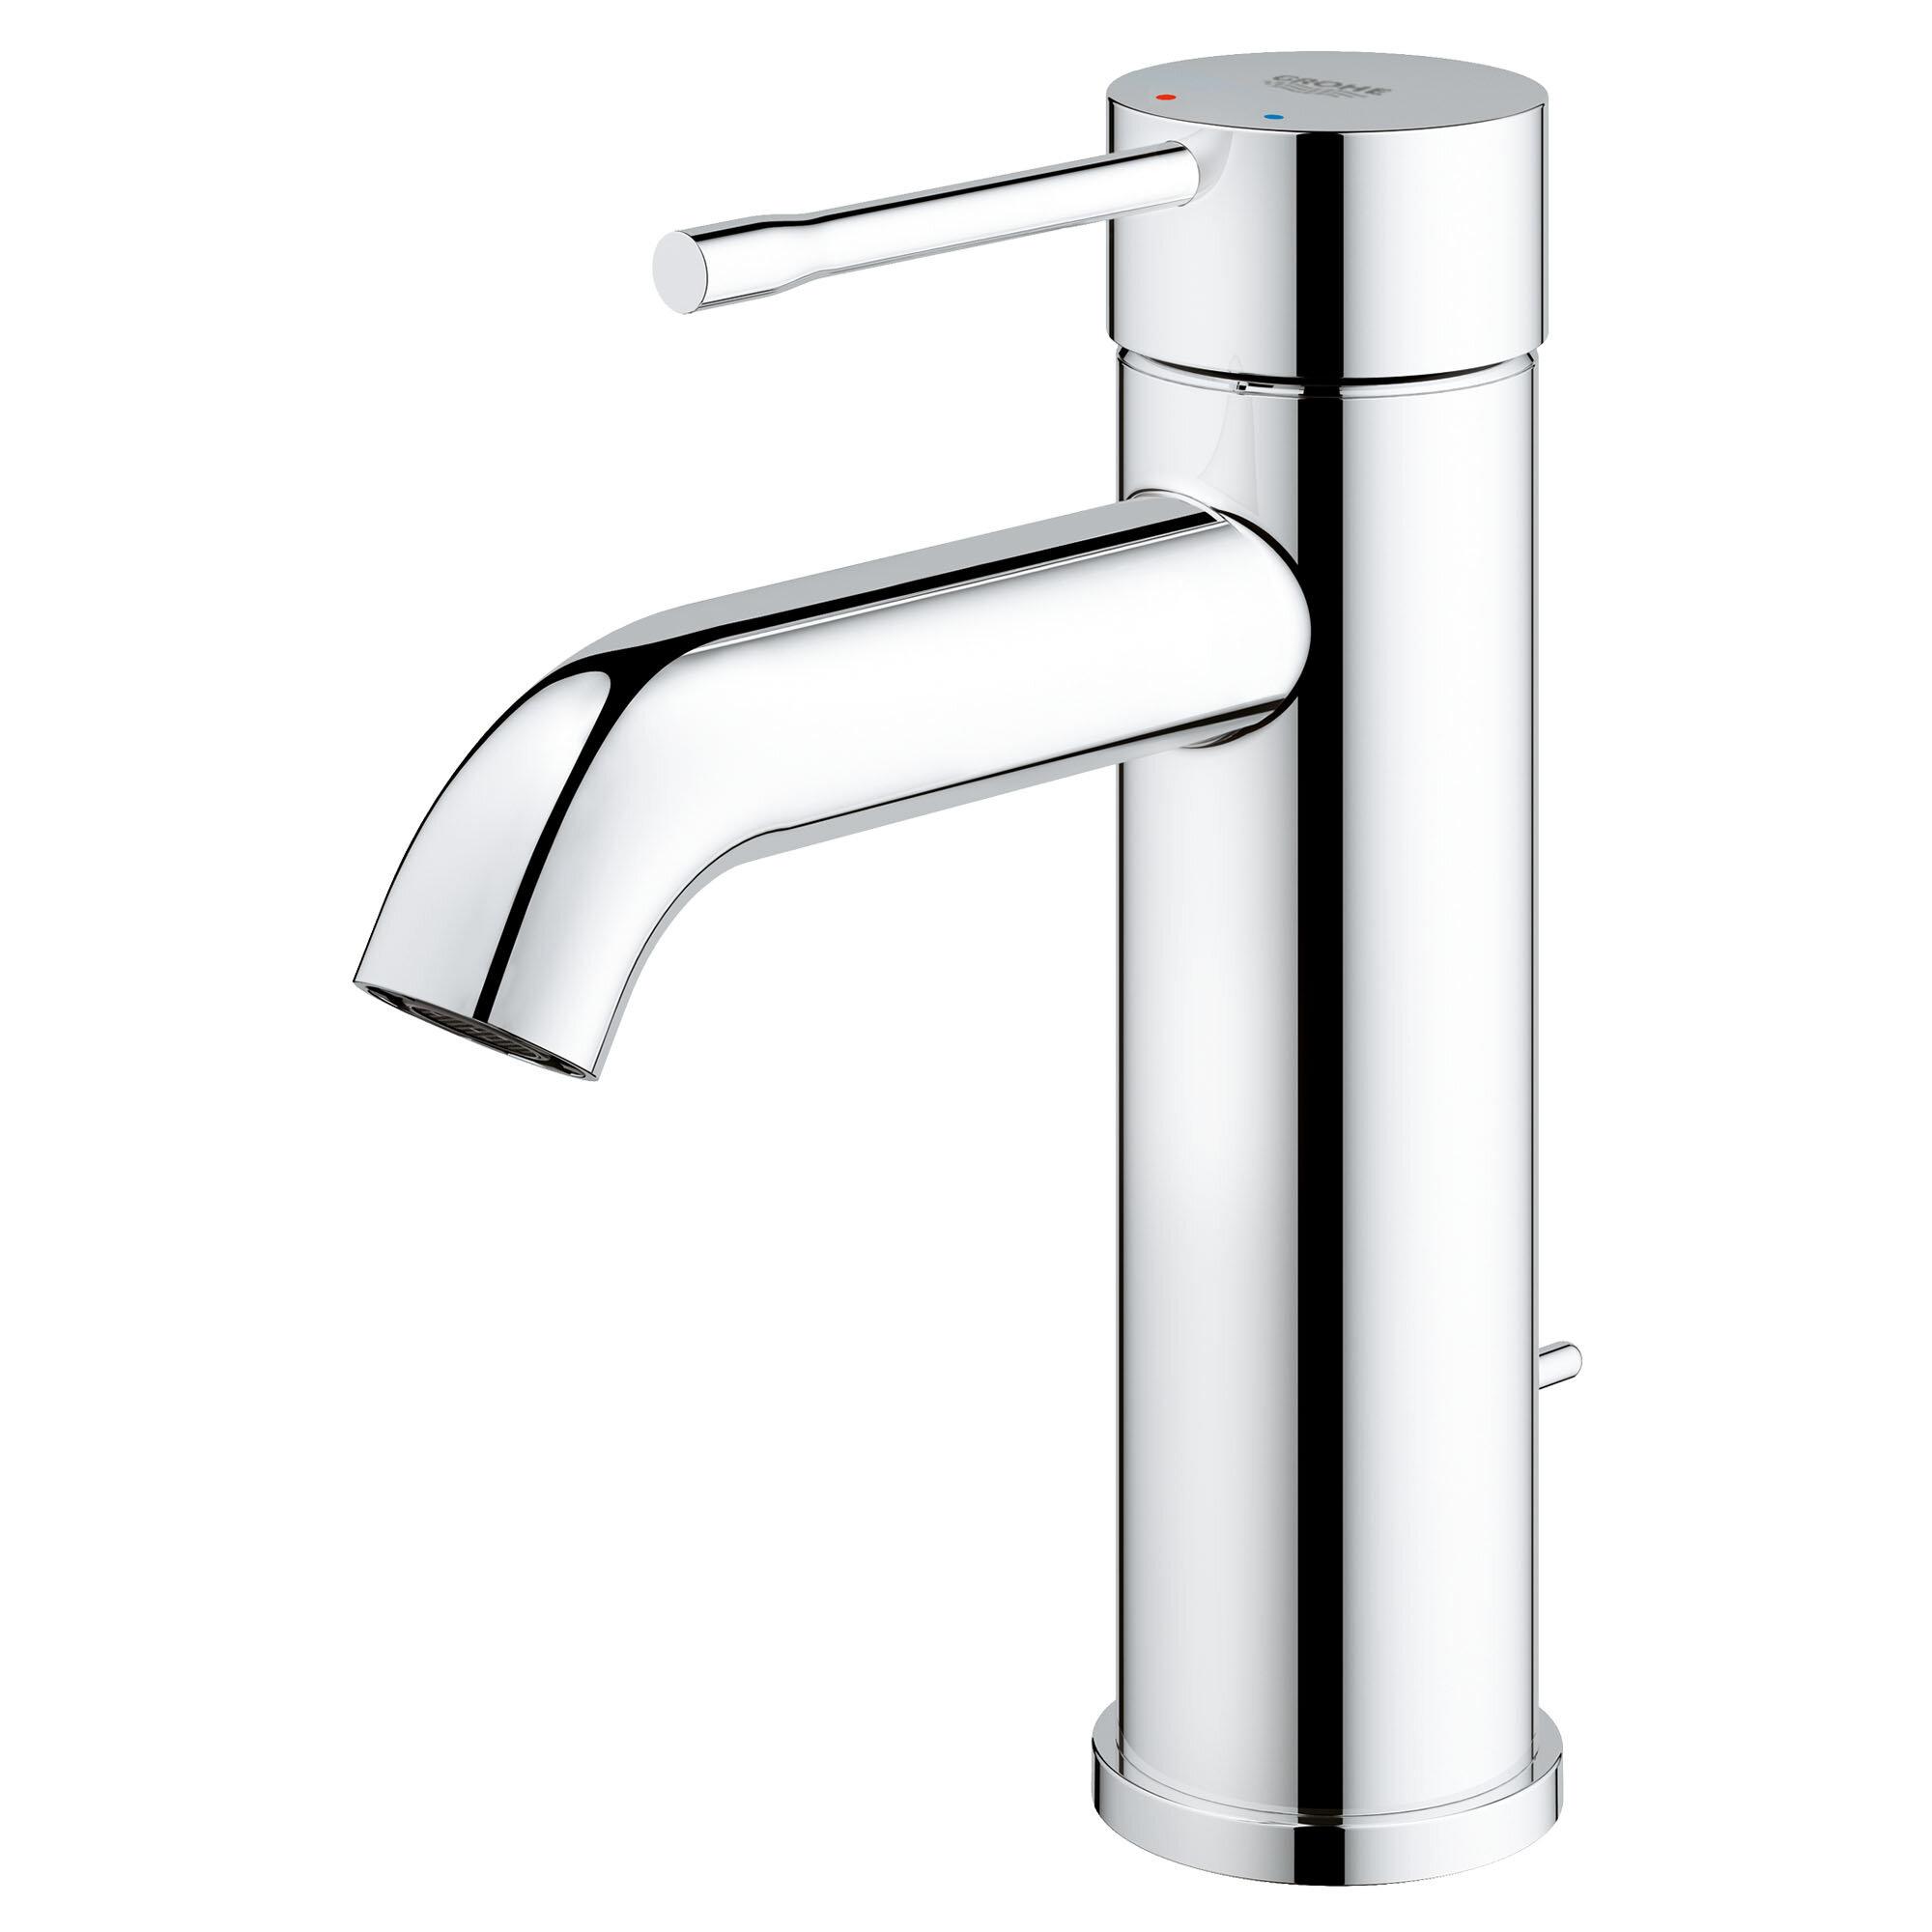 Grohe Essence Single Hole Bathroom Sink Faucet Reviews Wayfair